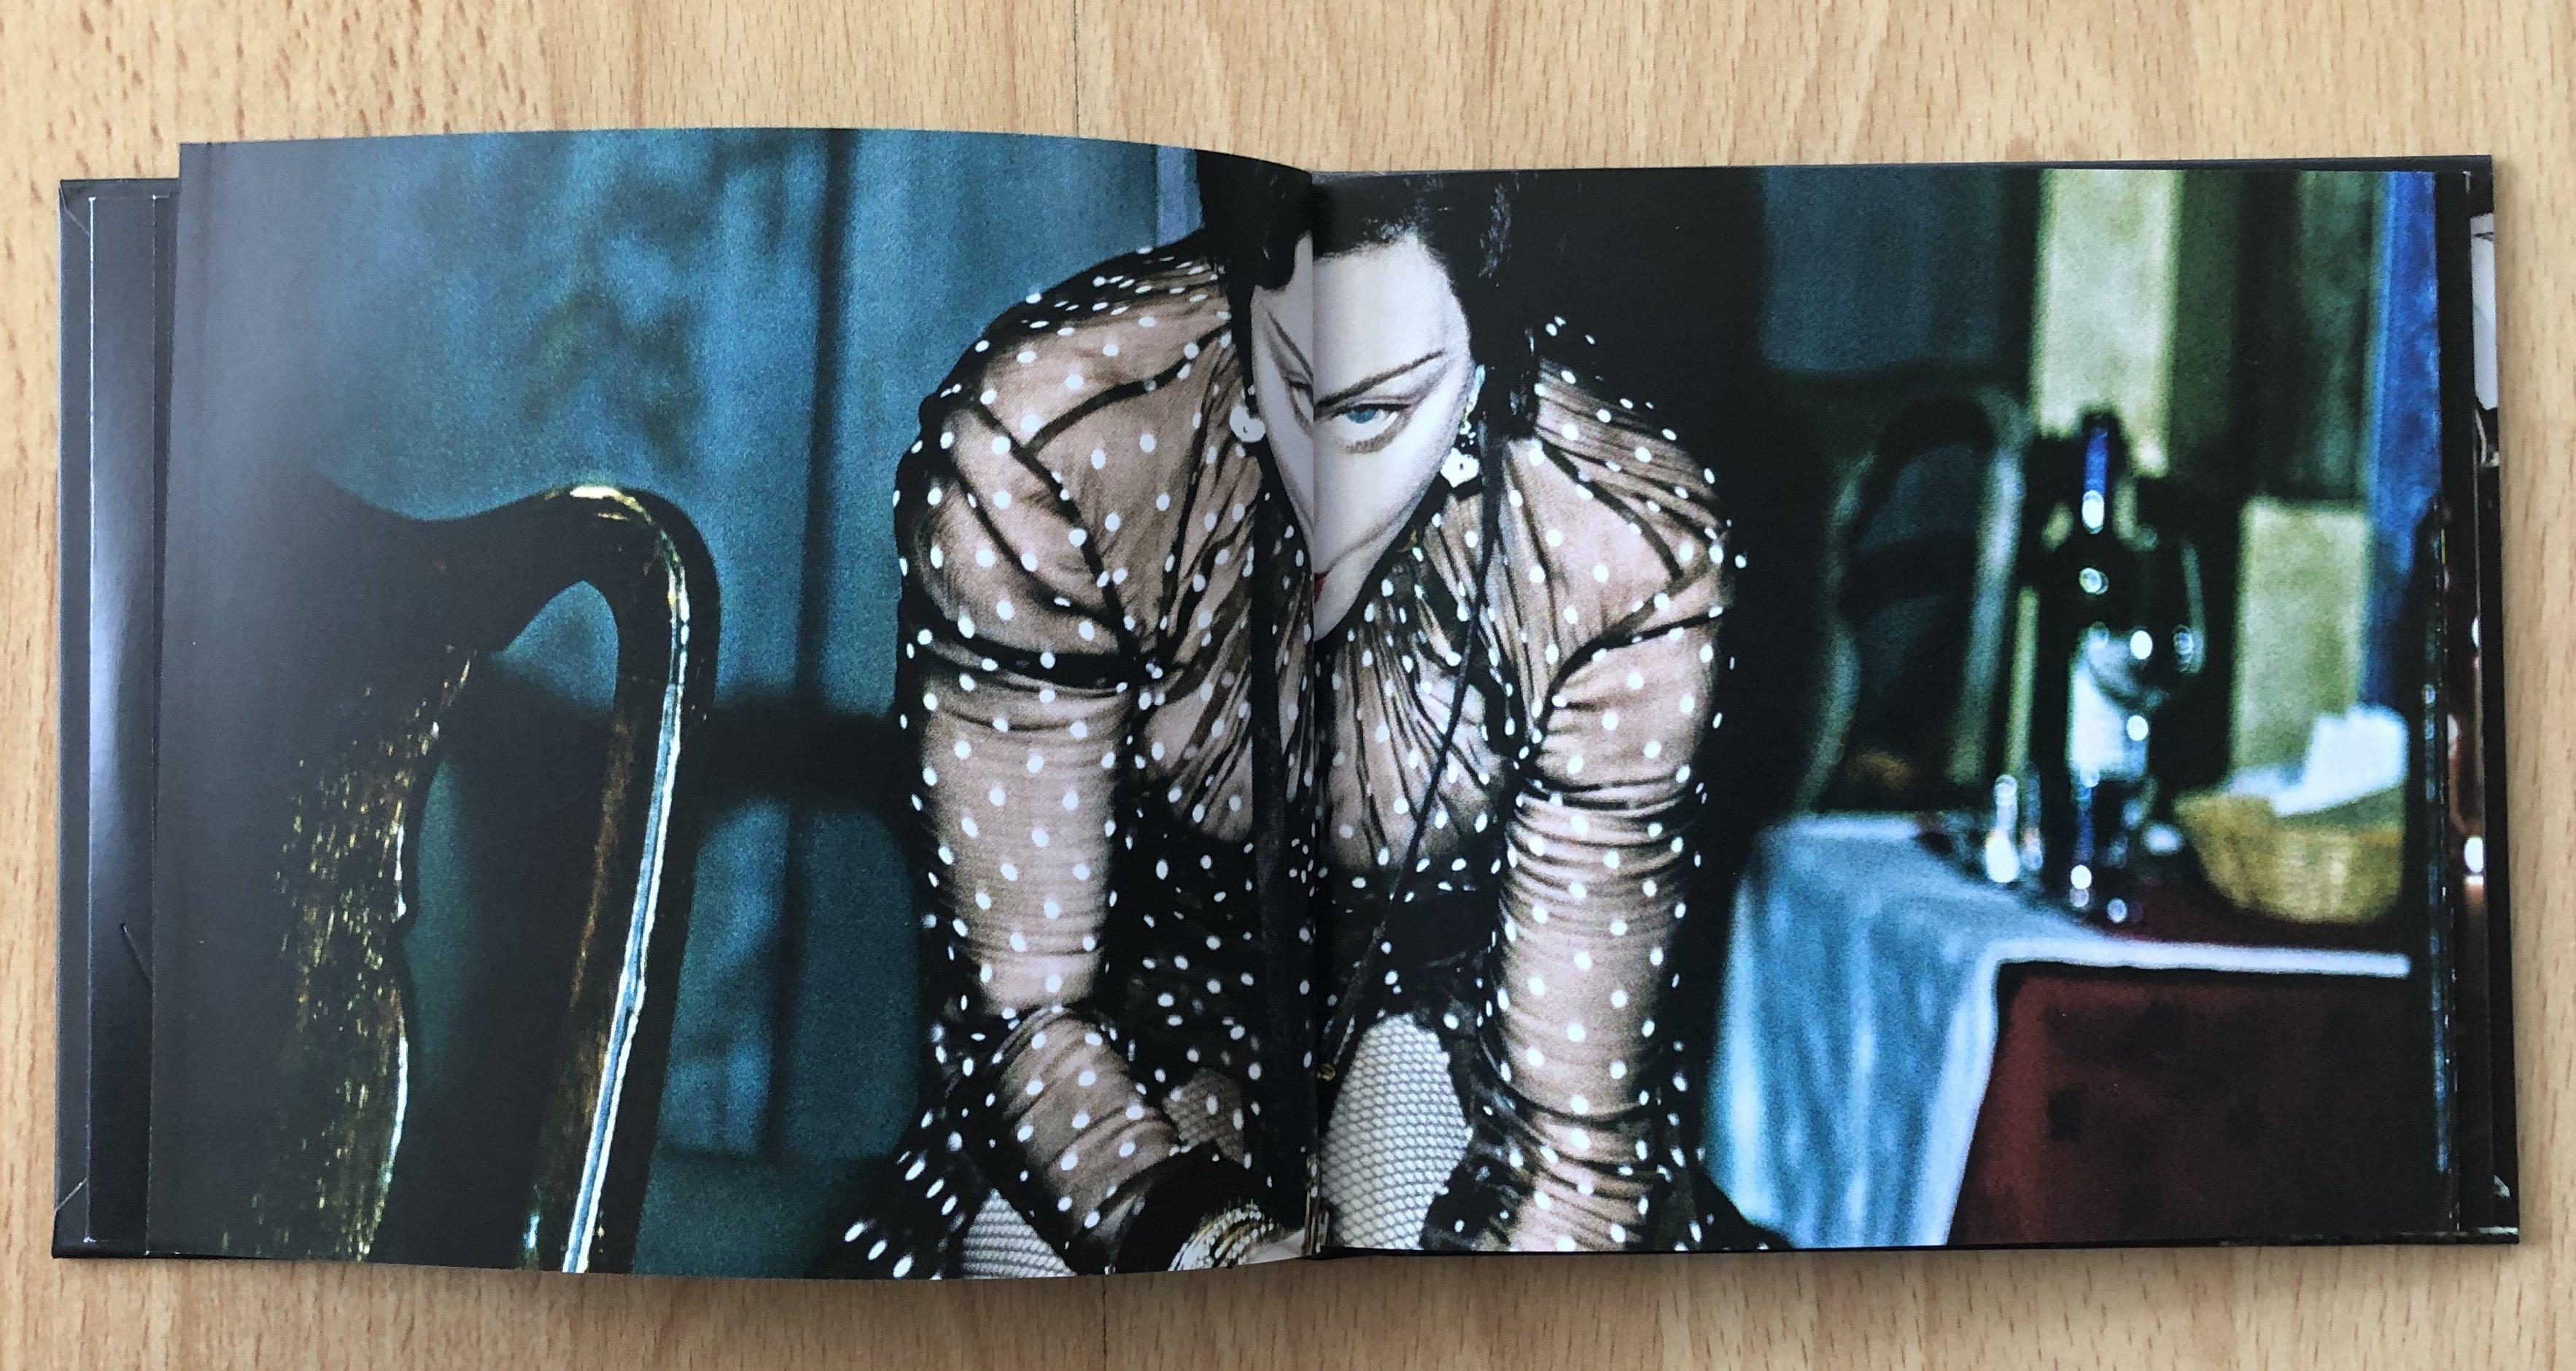 20190613-pictures-madonna-madame-x-boxset-booklet-06.jpeg